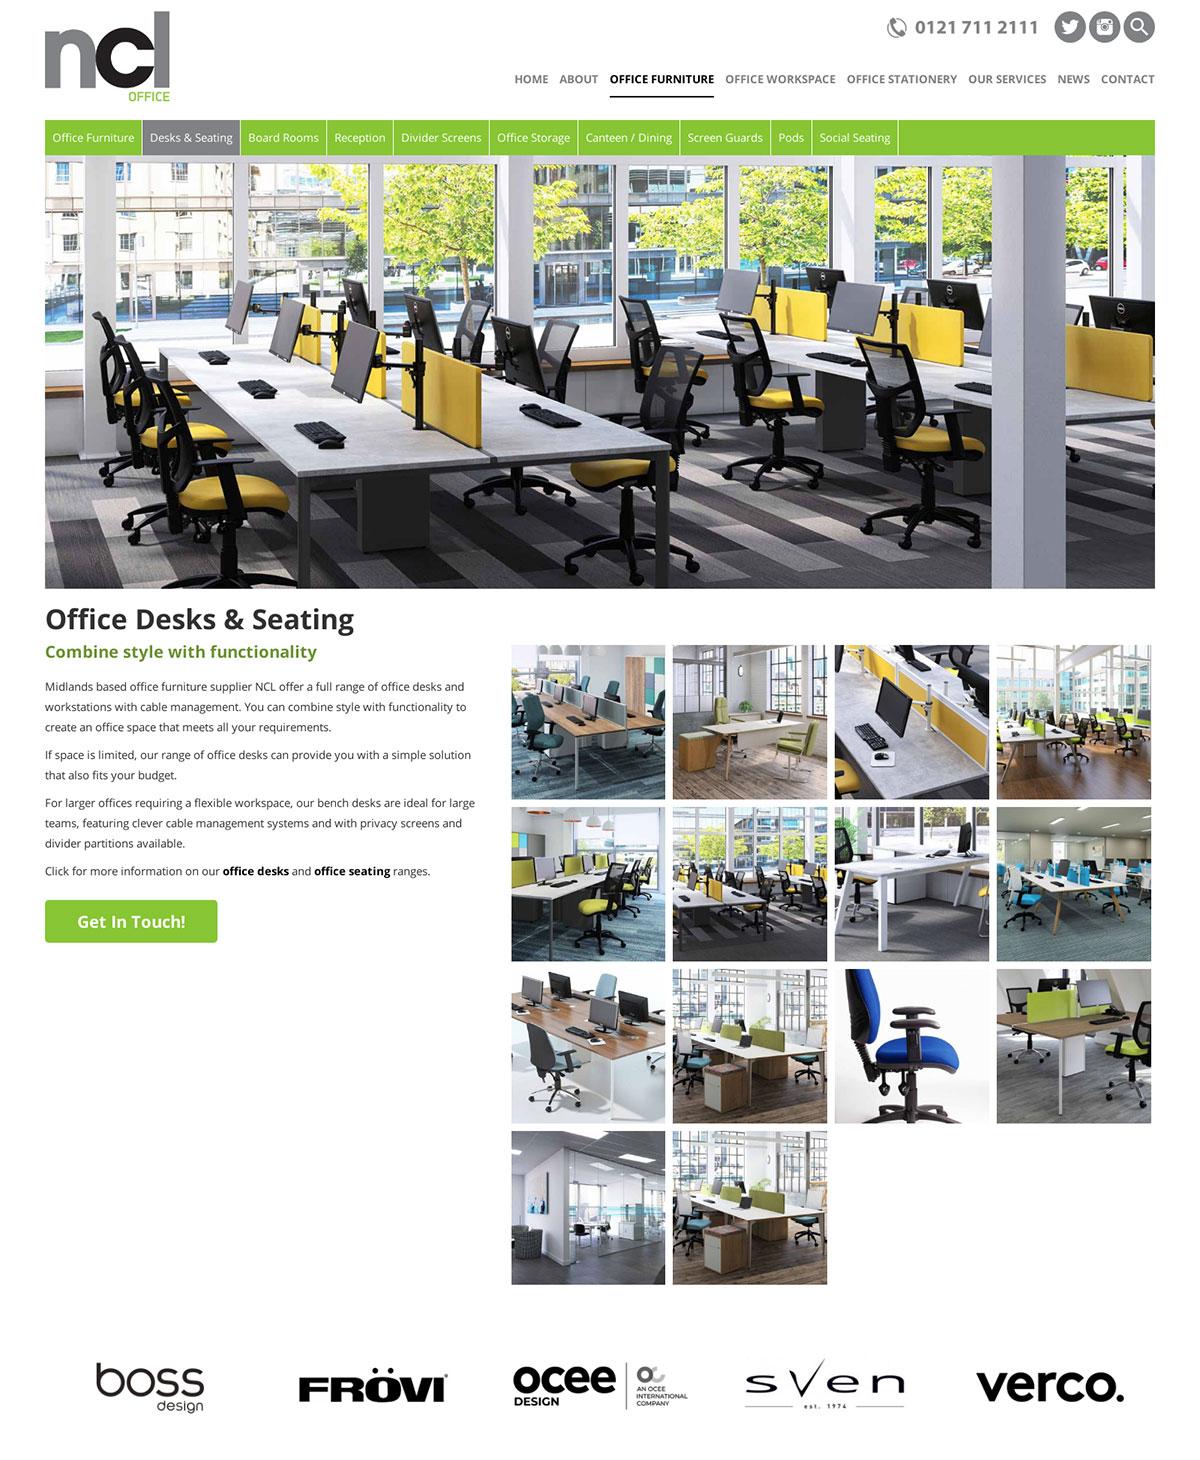 NCL Office Website Birmingham